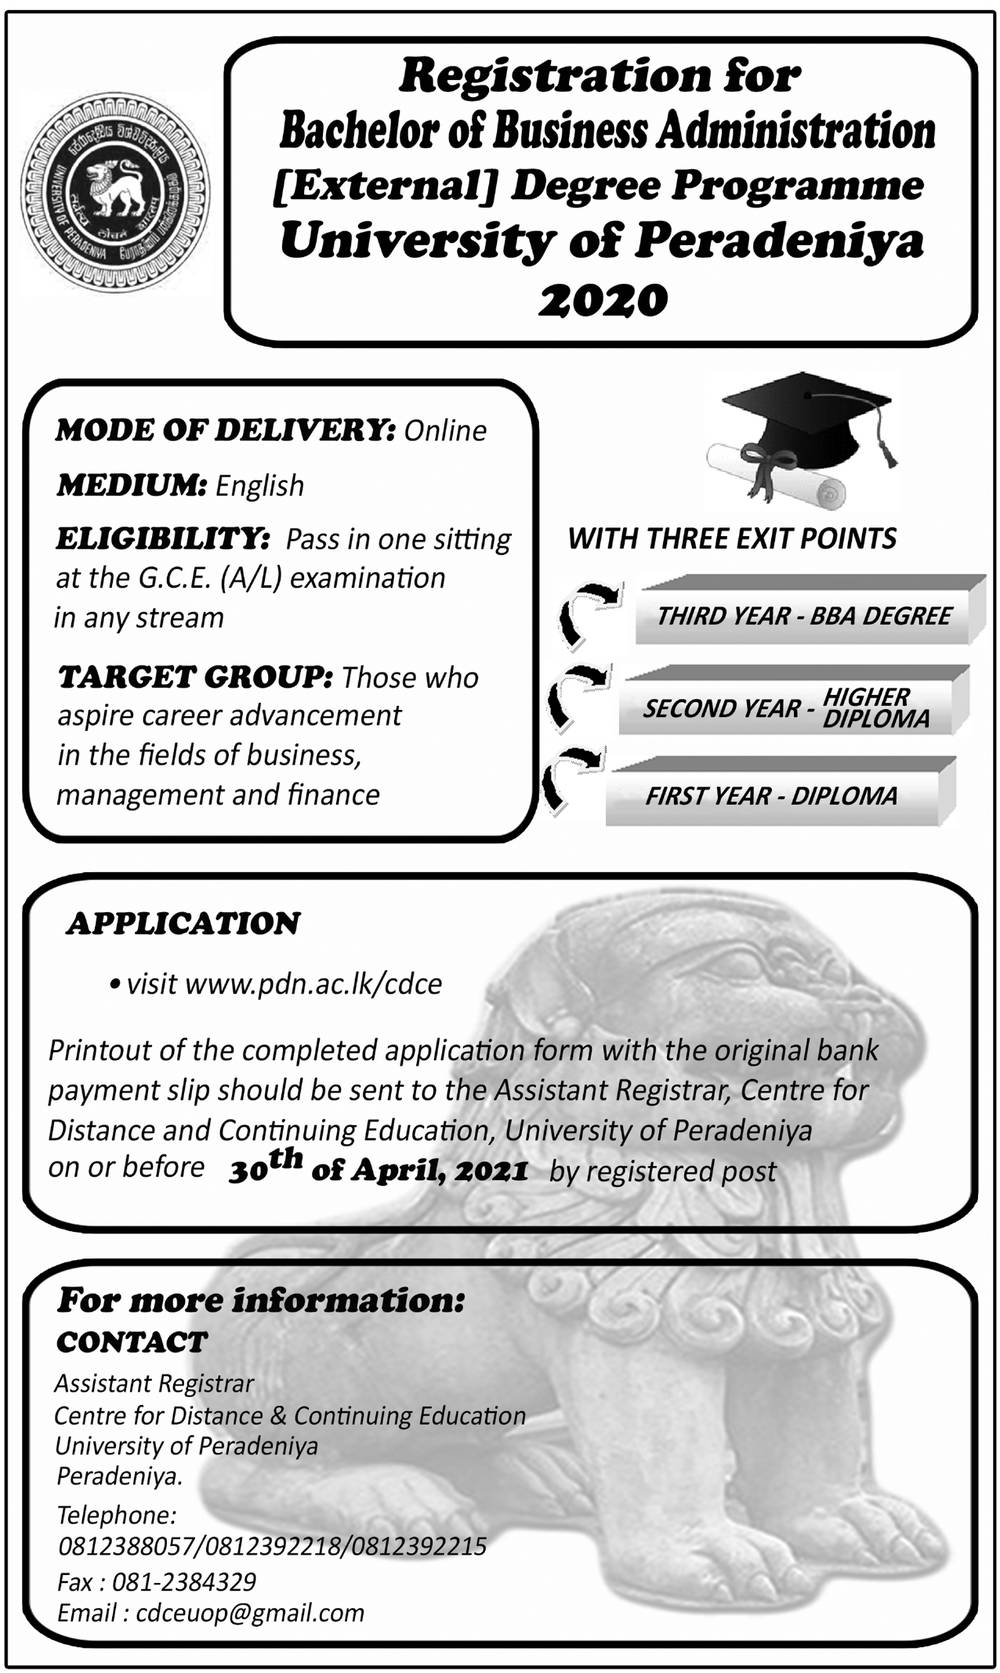 Registration for Bachelor of Business Administration (External) Degree Programme - University of Peradeniya